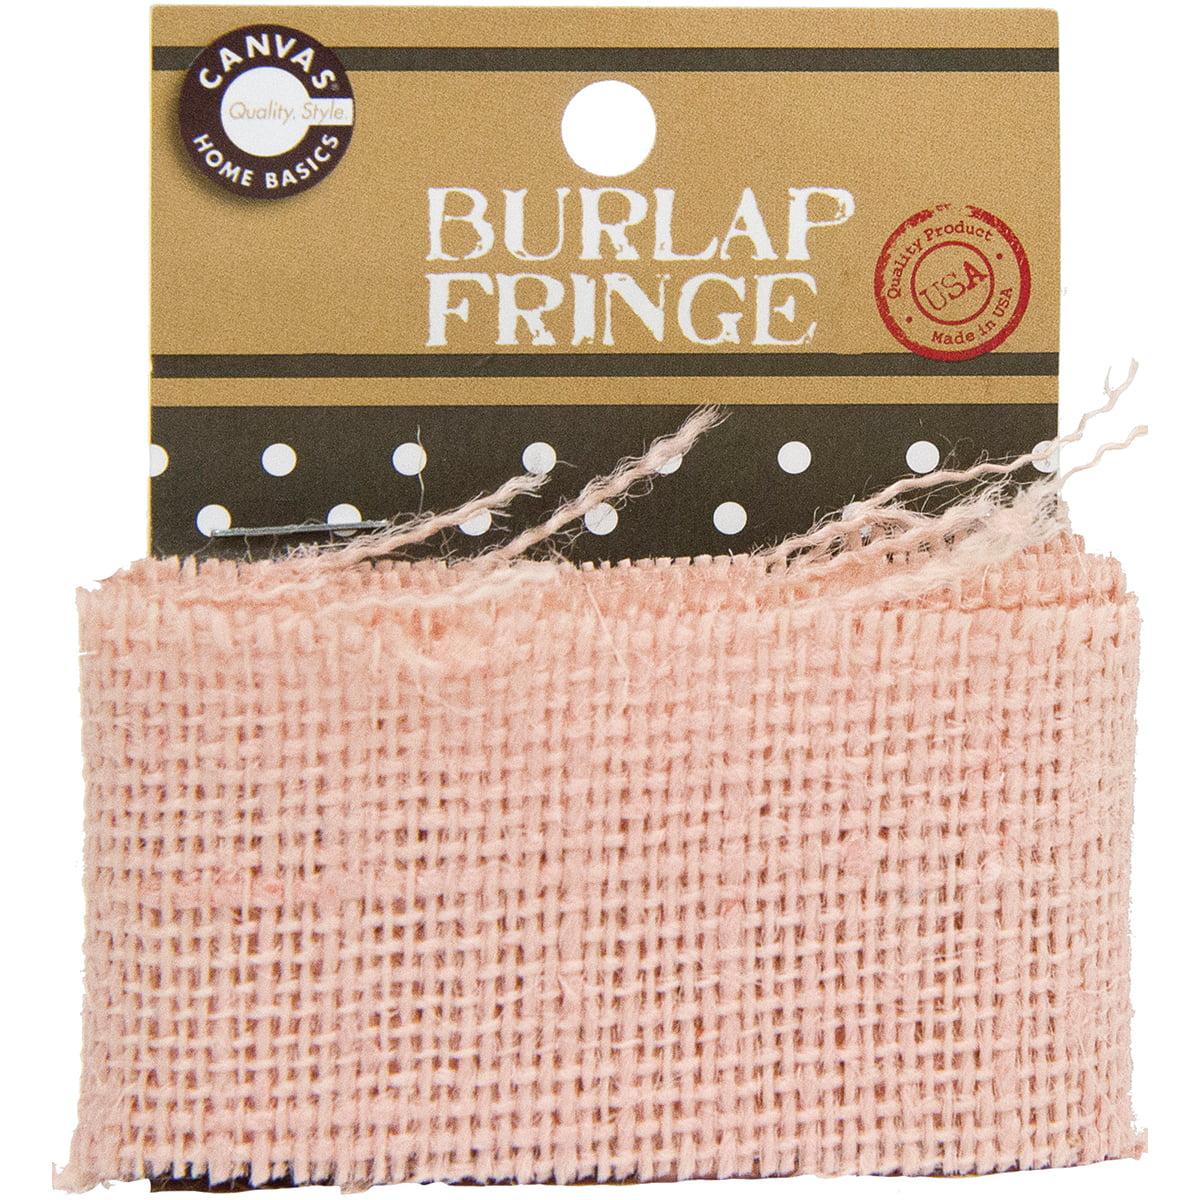 Canvas Corp Burlap Fringe, 1-Yard, Light Pink Multi-Colored